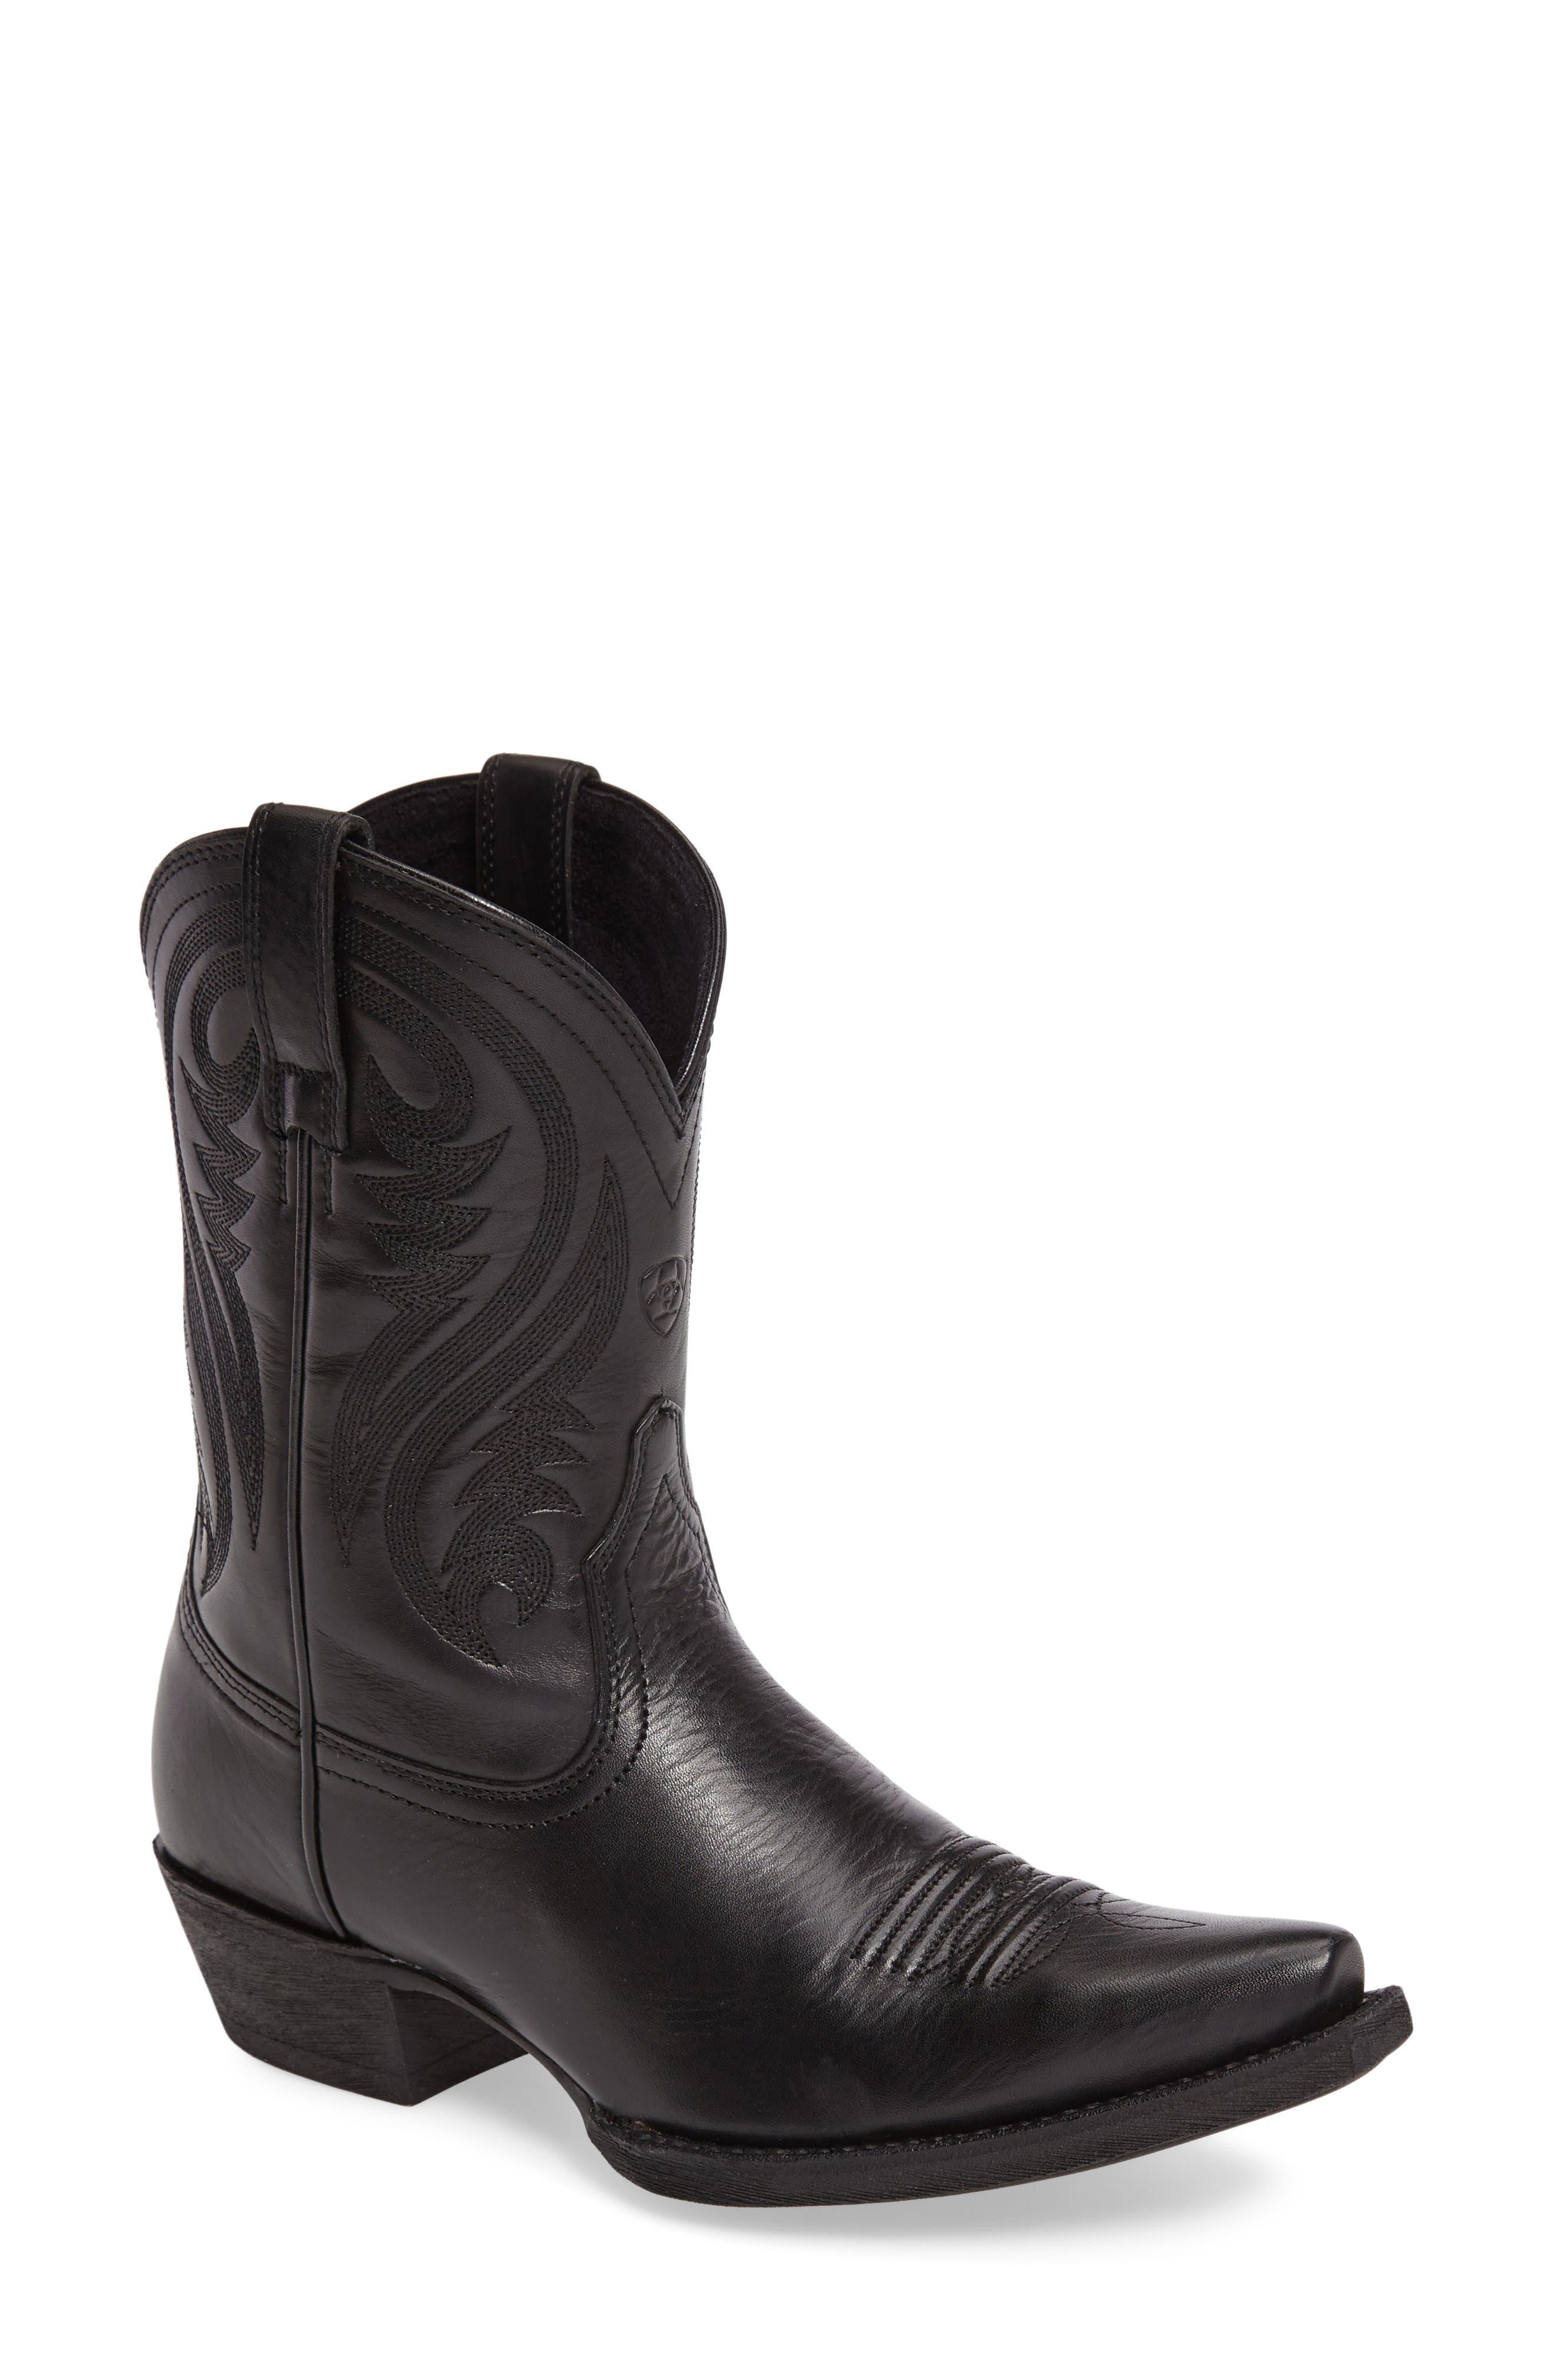 Main Image - Ariat Willow Western Boot (Women)